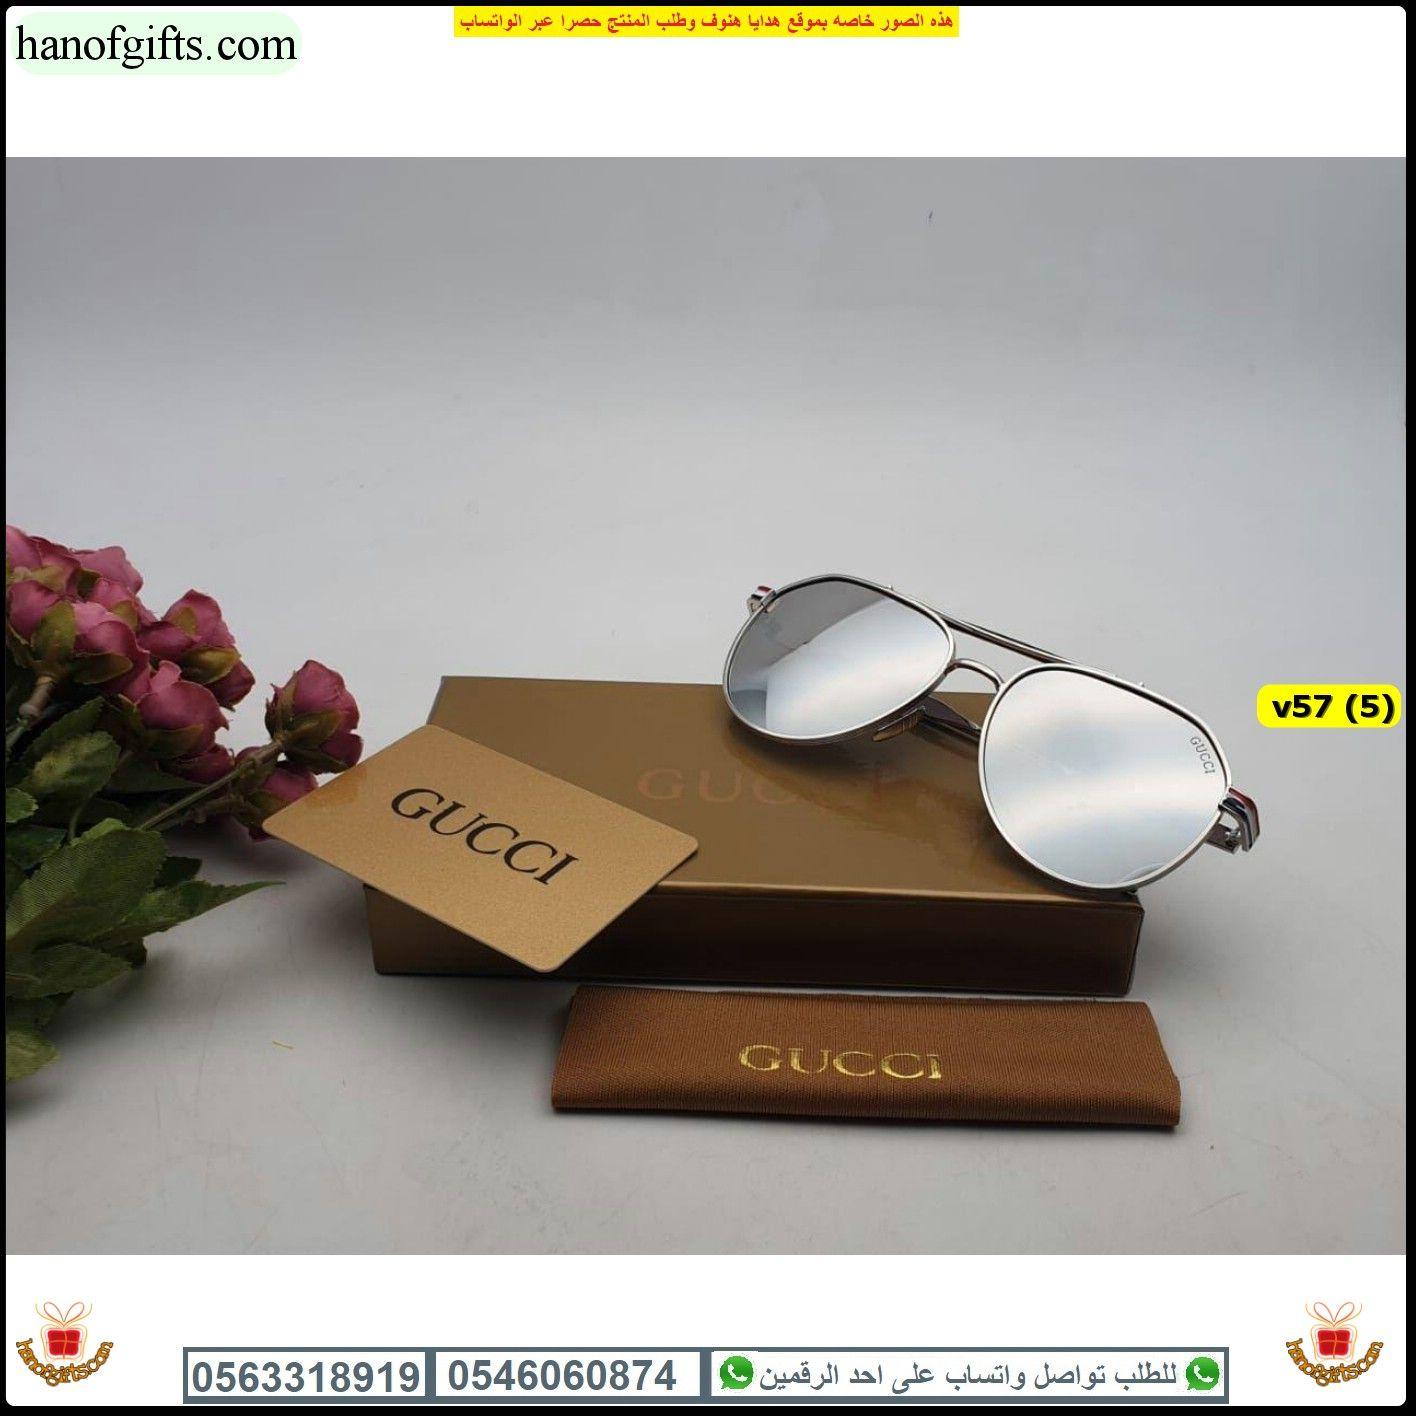 نظارات تقليد ماركة بالرياض قوتشي مع ملحقات الماركه Gucci هدايا هنوف Sunglasses Case Glasses Sunglasses